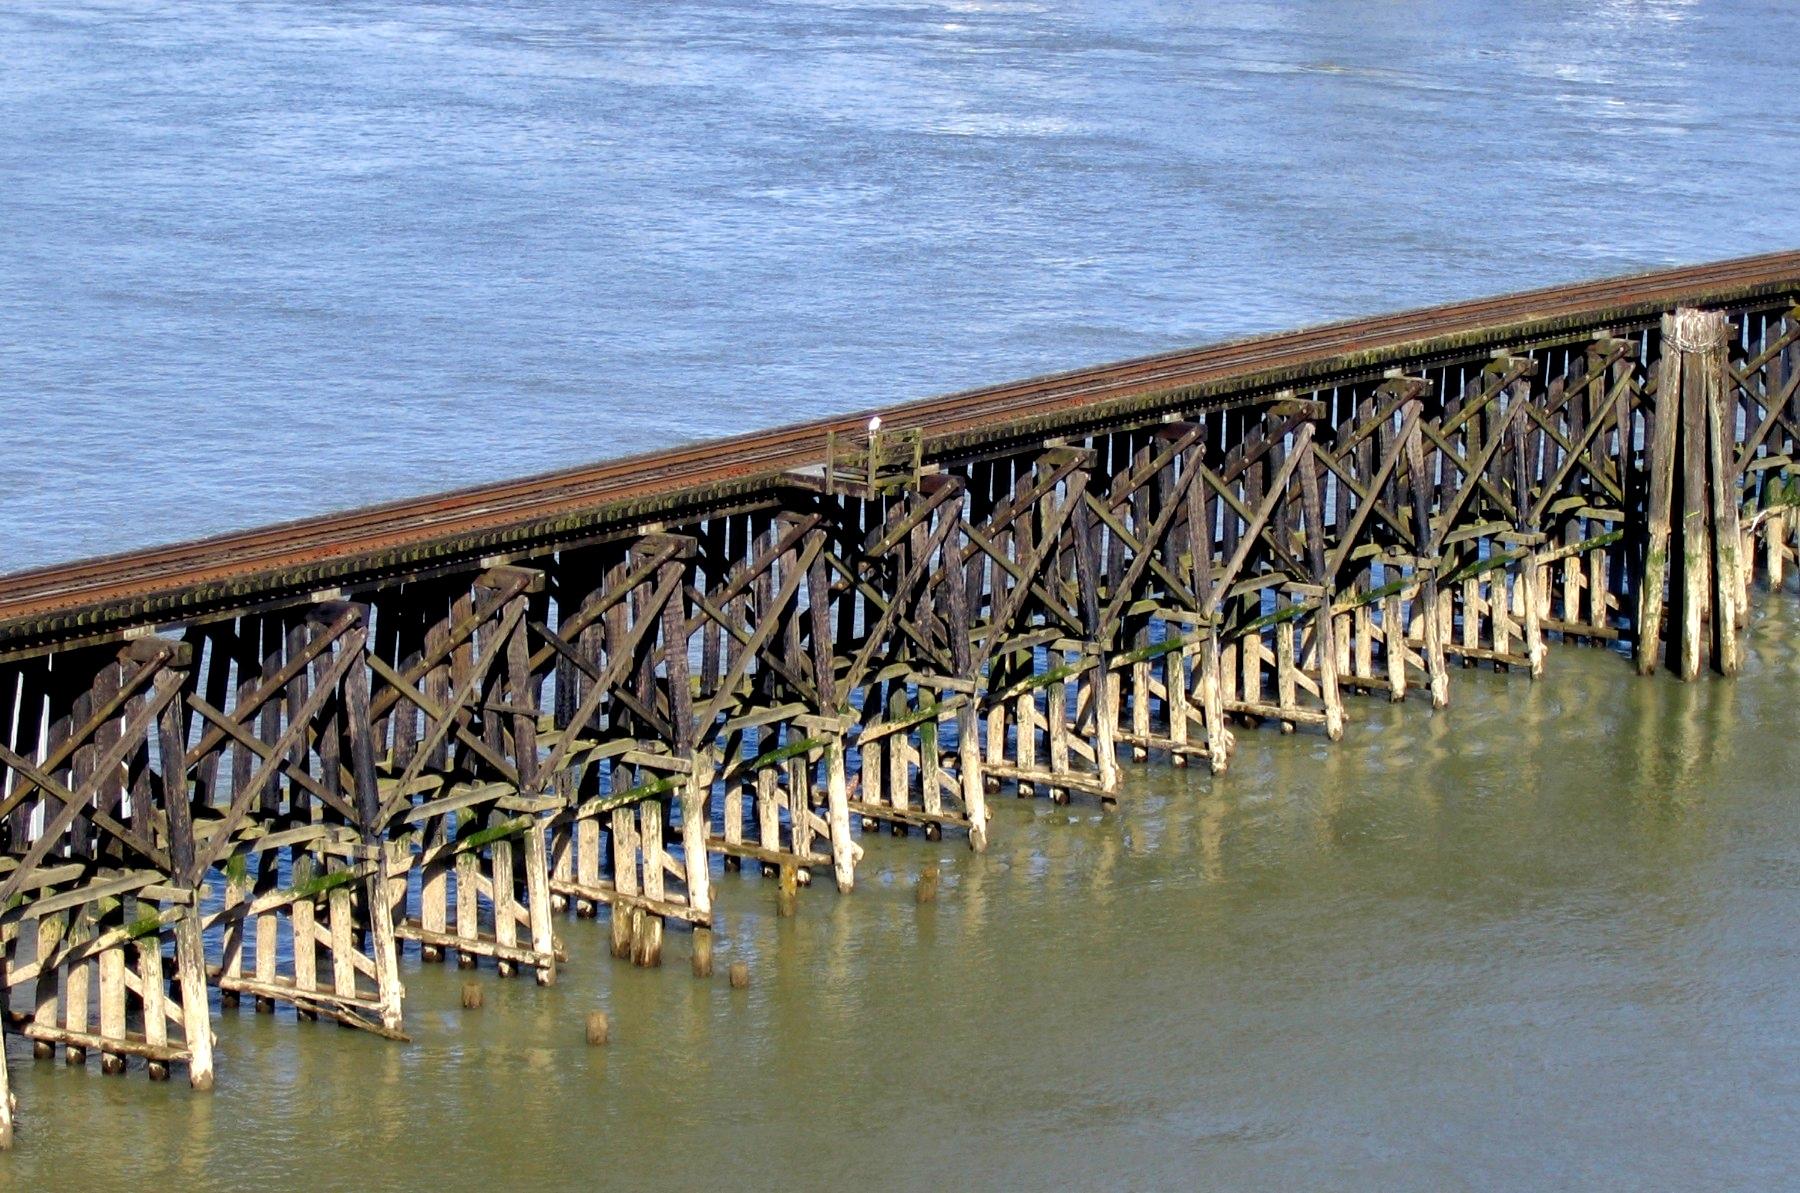 Trestle bridge - Wikipedia